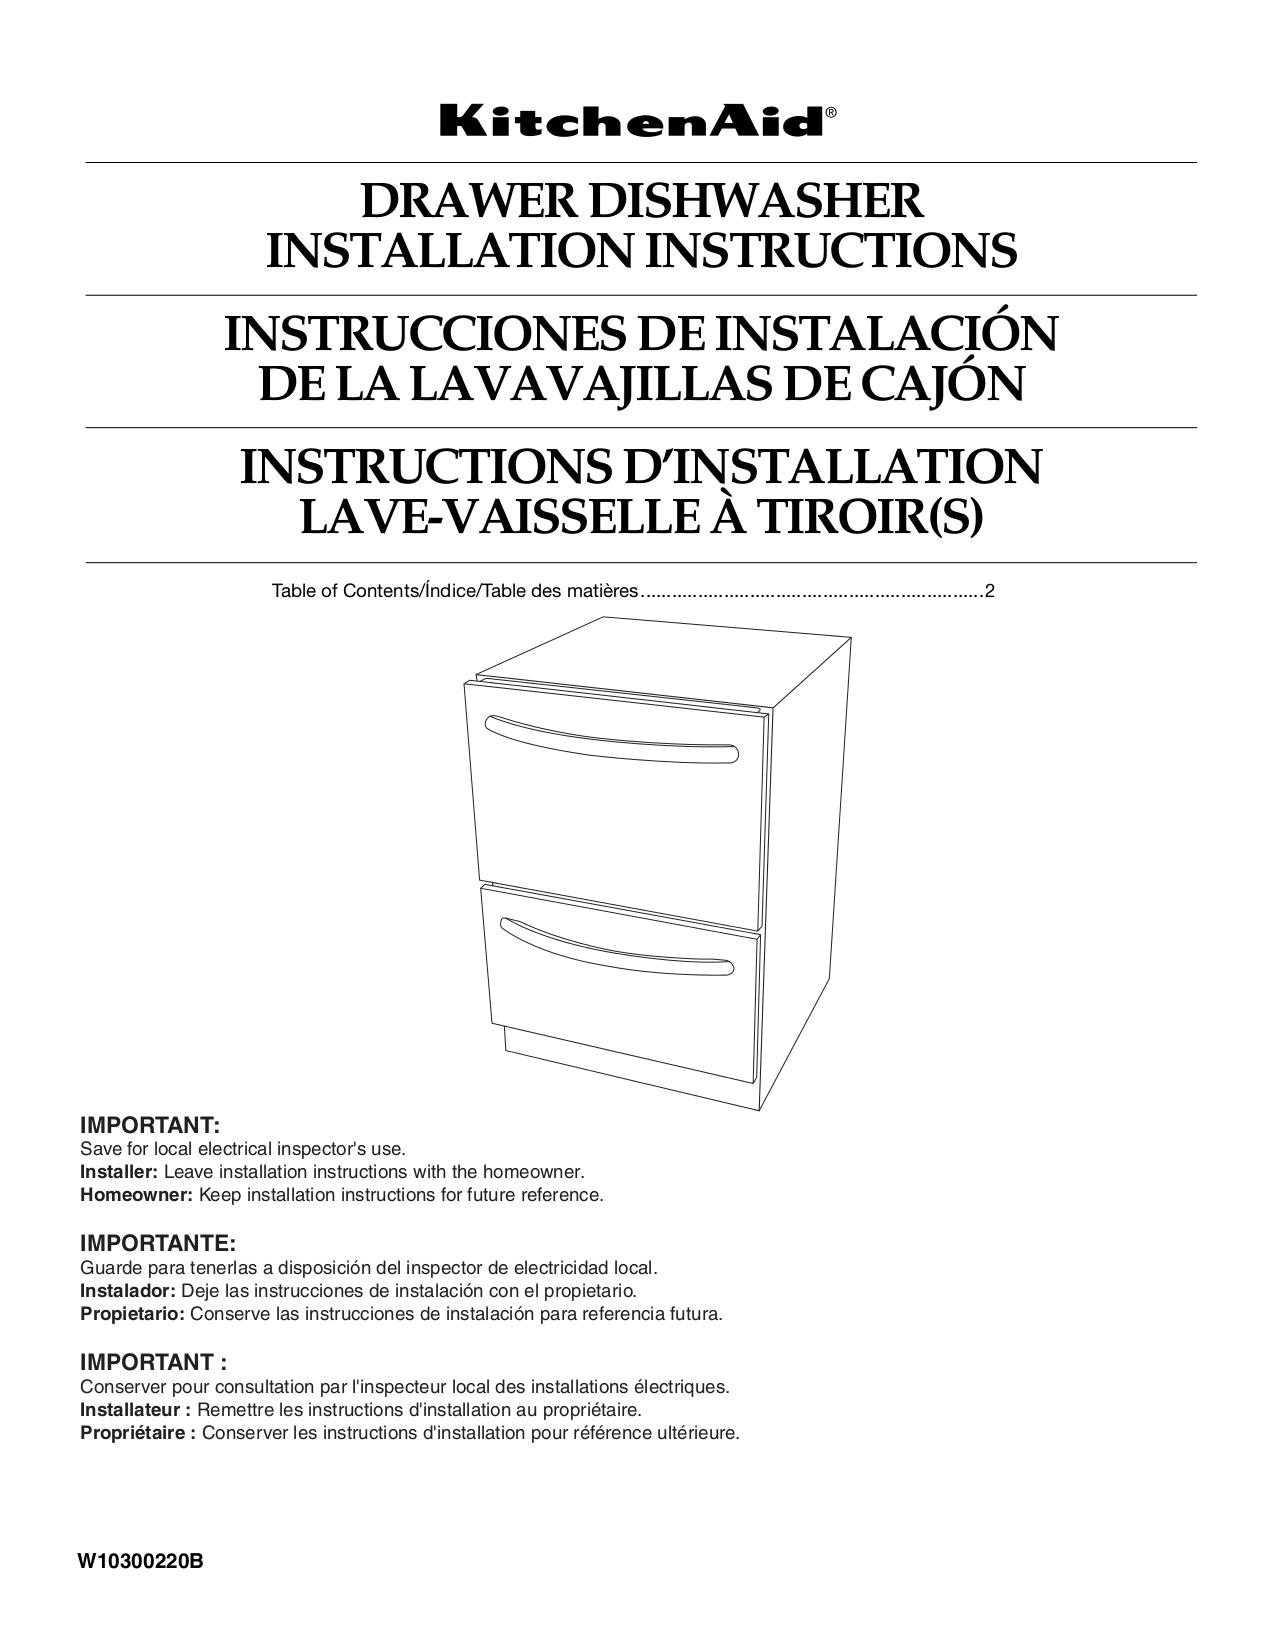 Pdf Manual For Kitchenaid Dishwasher Kudd03dtss Manual Guide